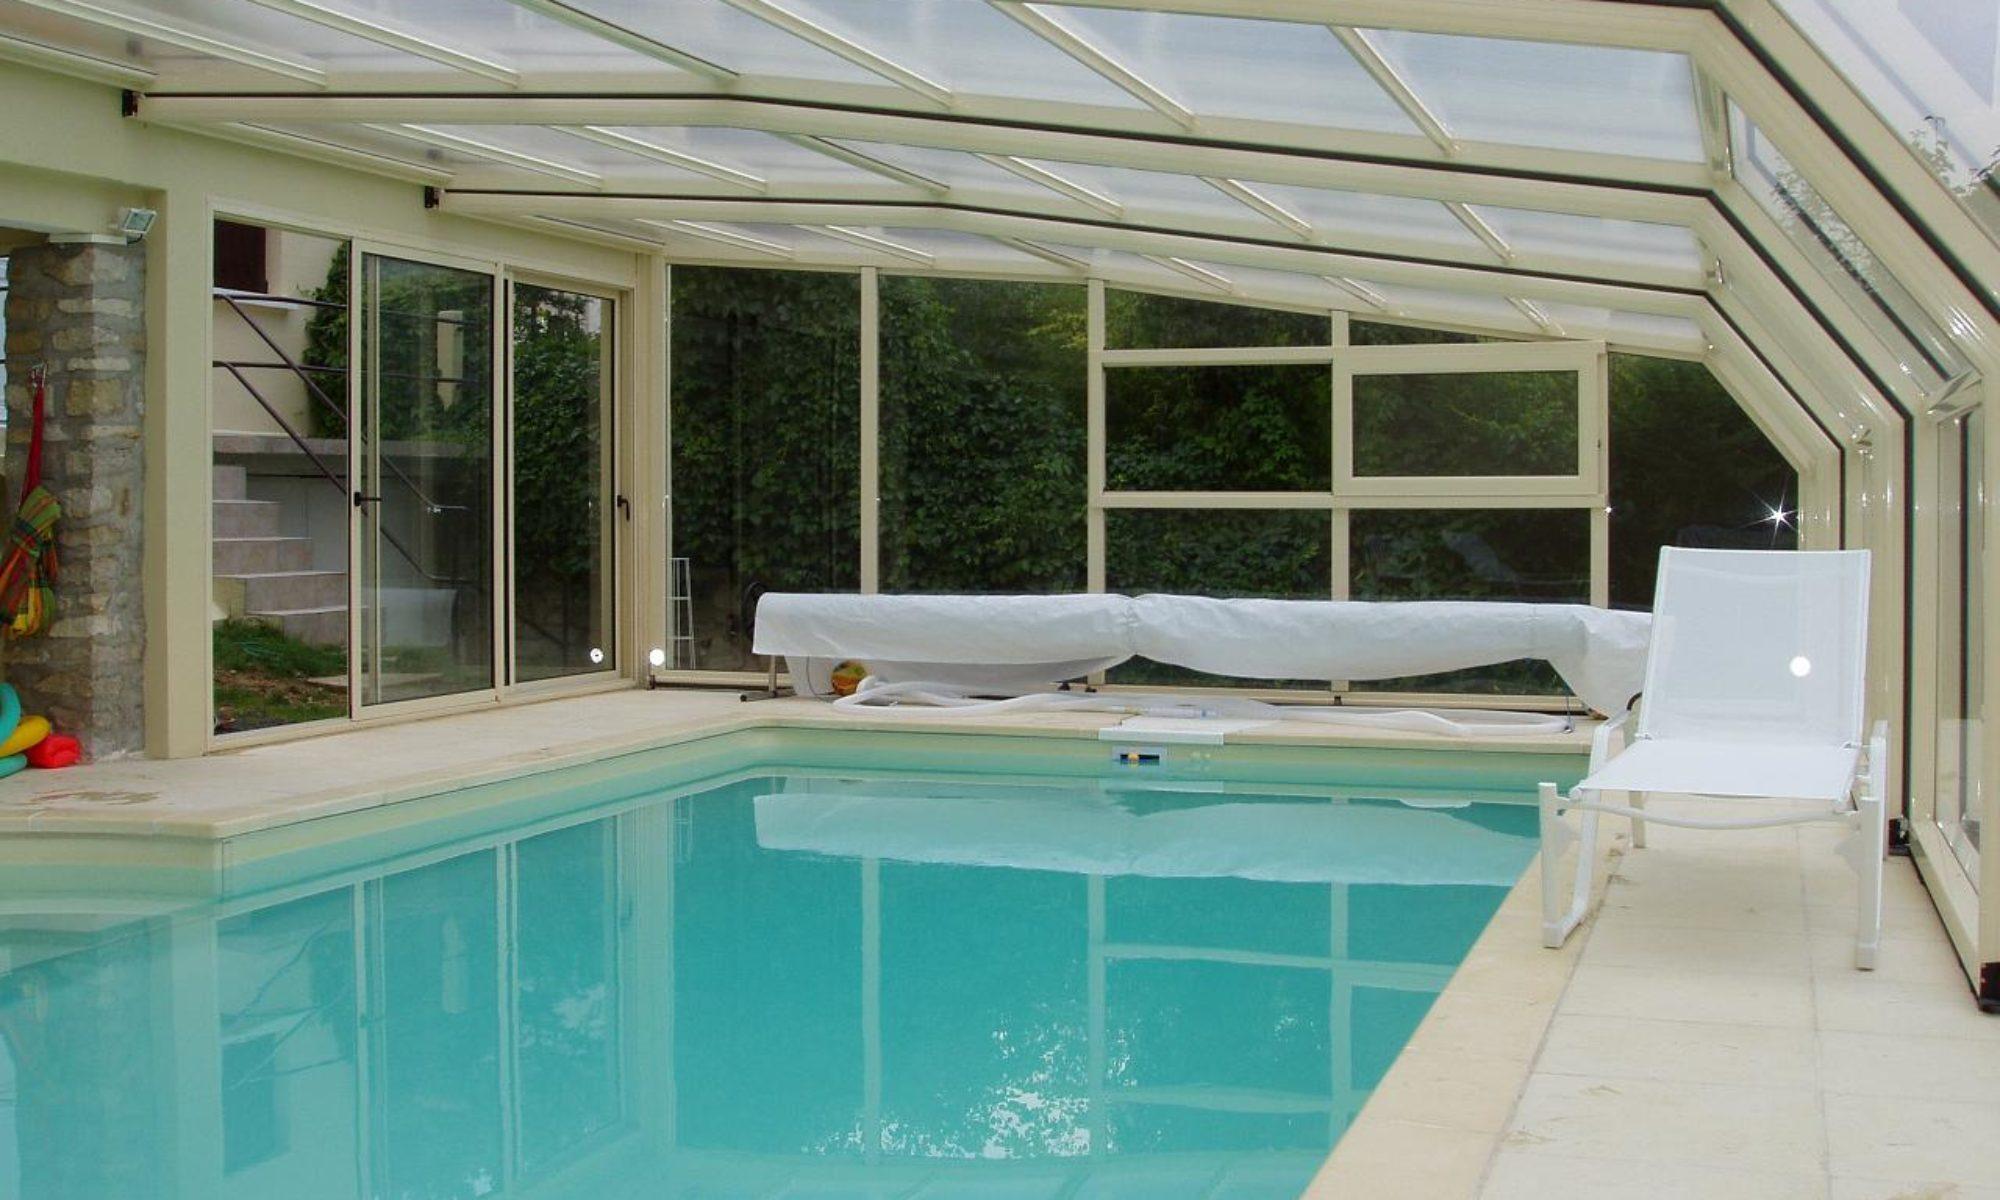 Abri piscine : Comment bien choisir son abri piscine